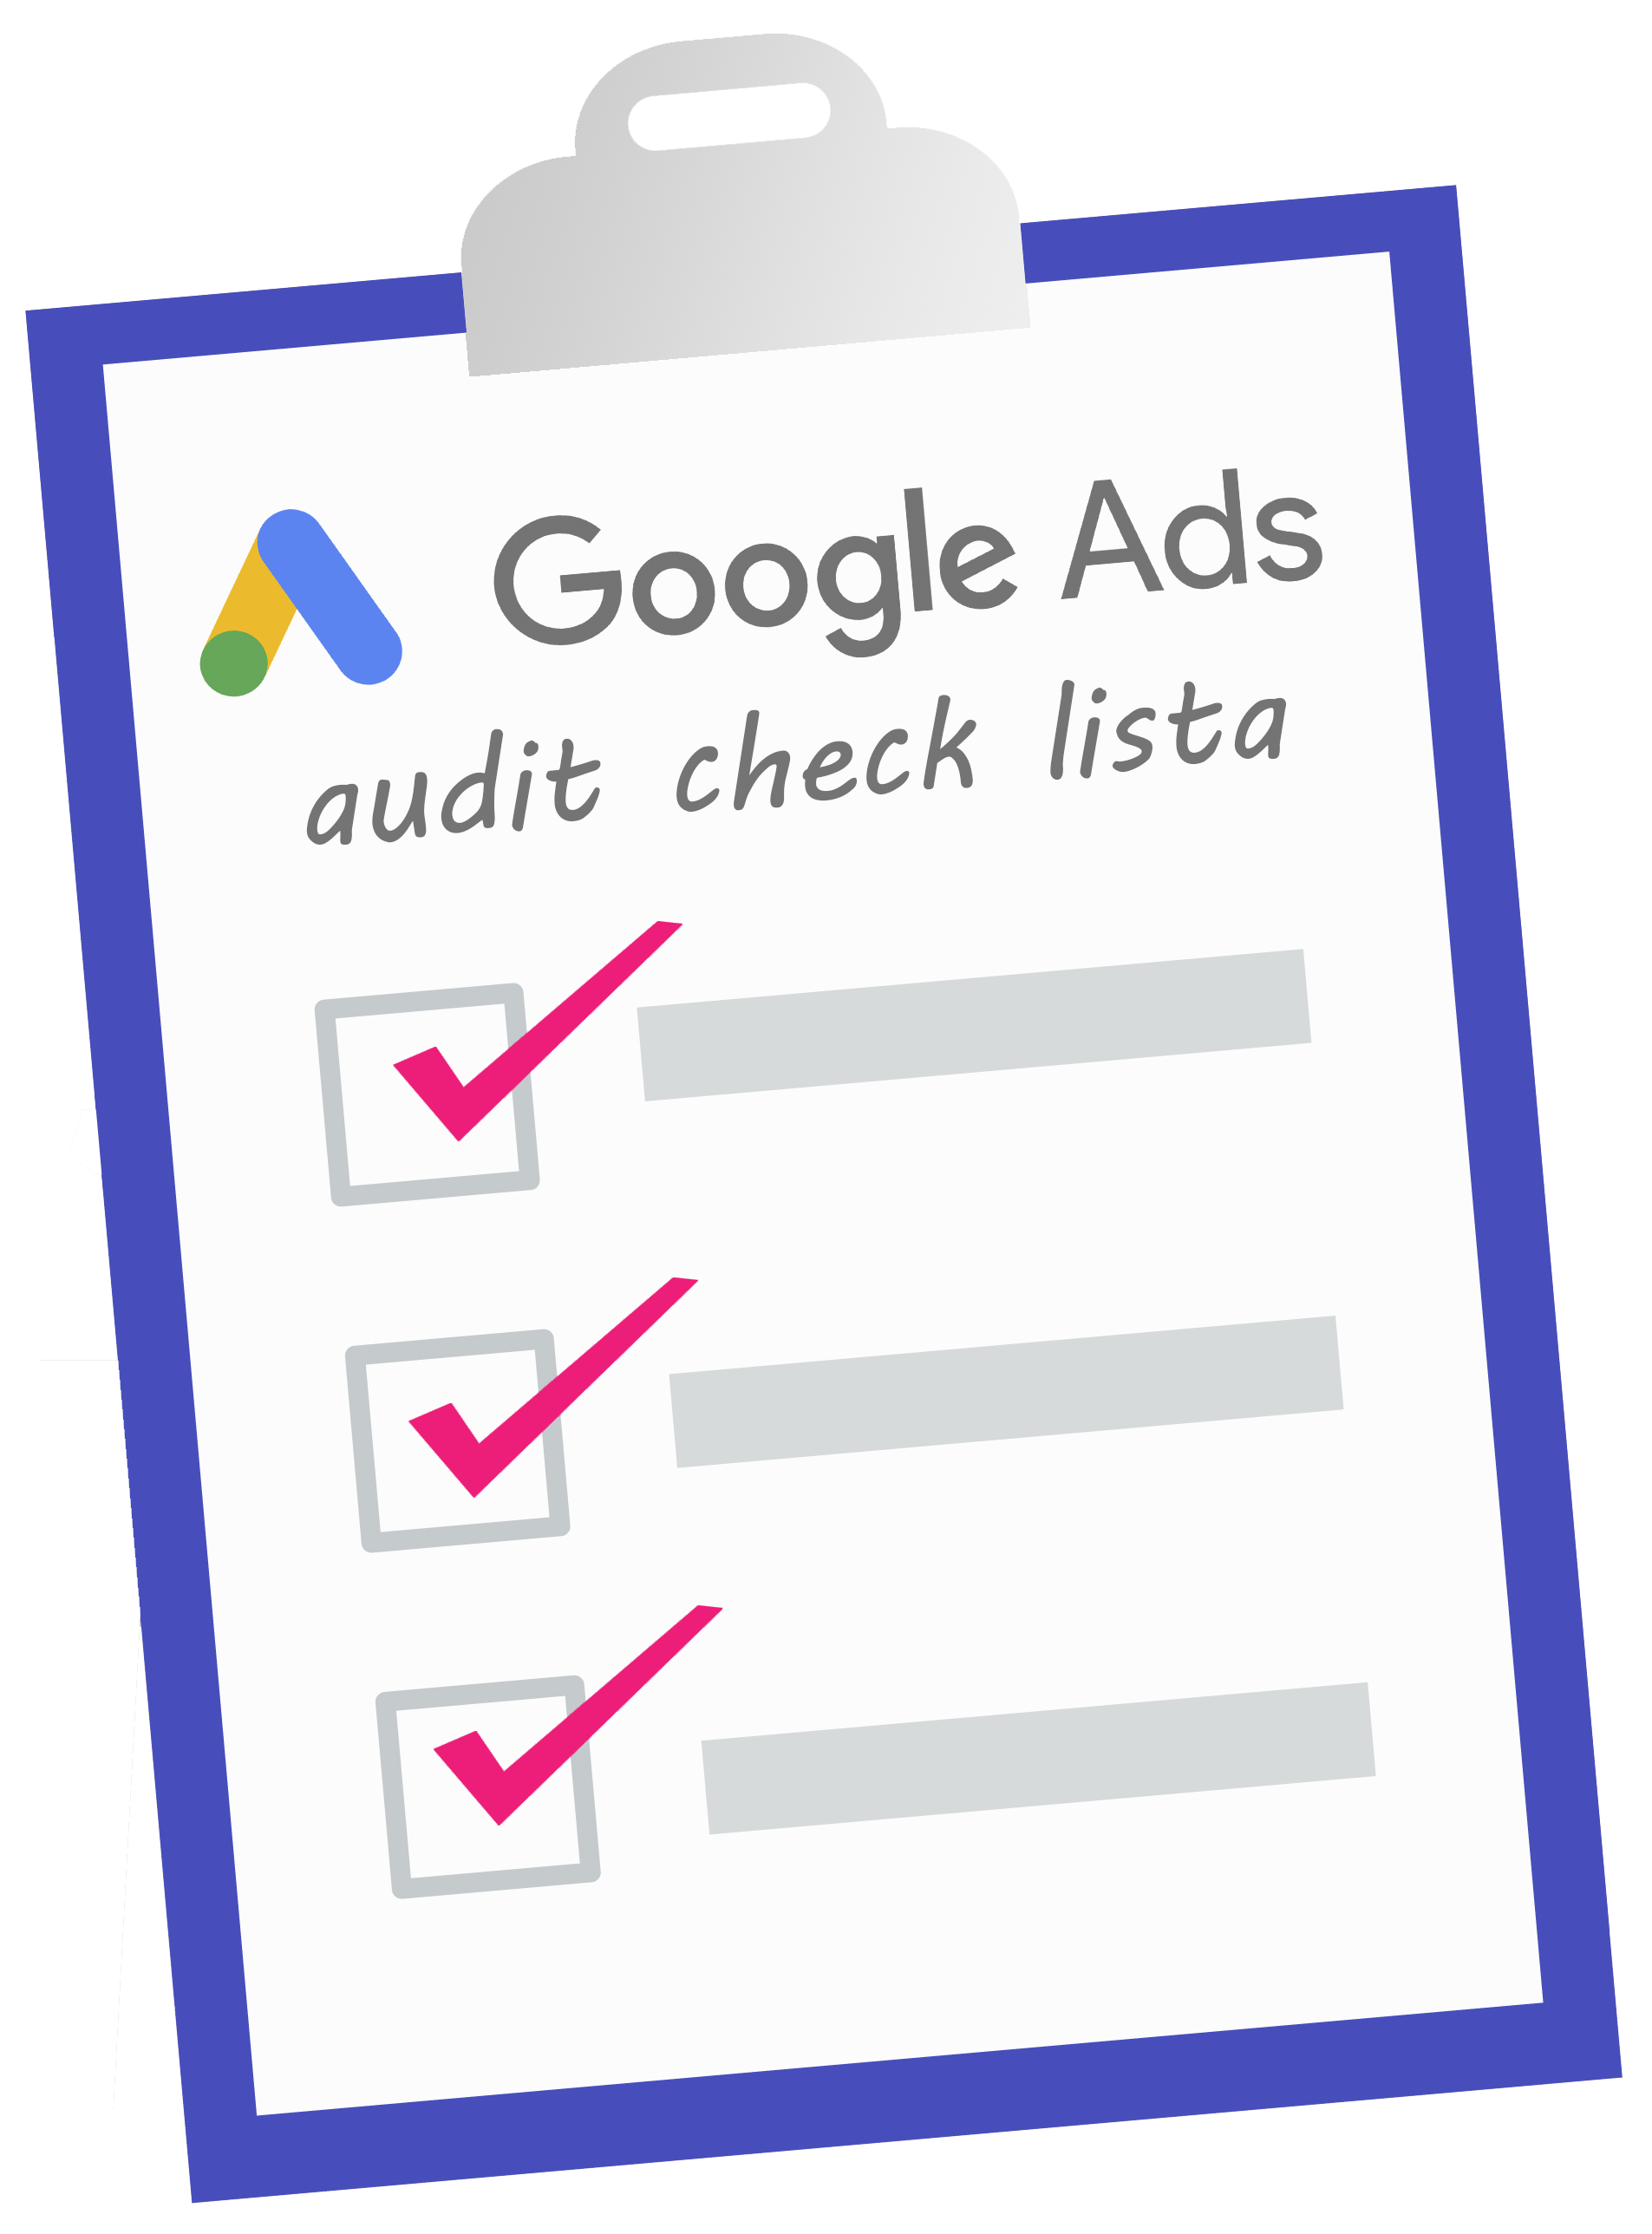 Google Ads checklist_adnetmedia